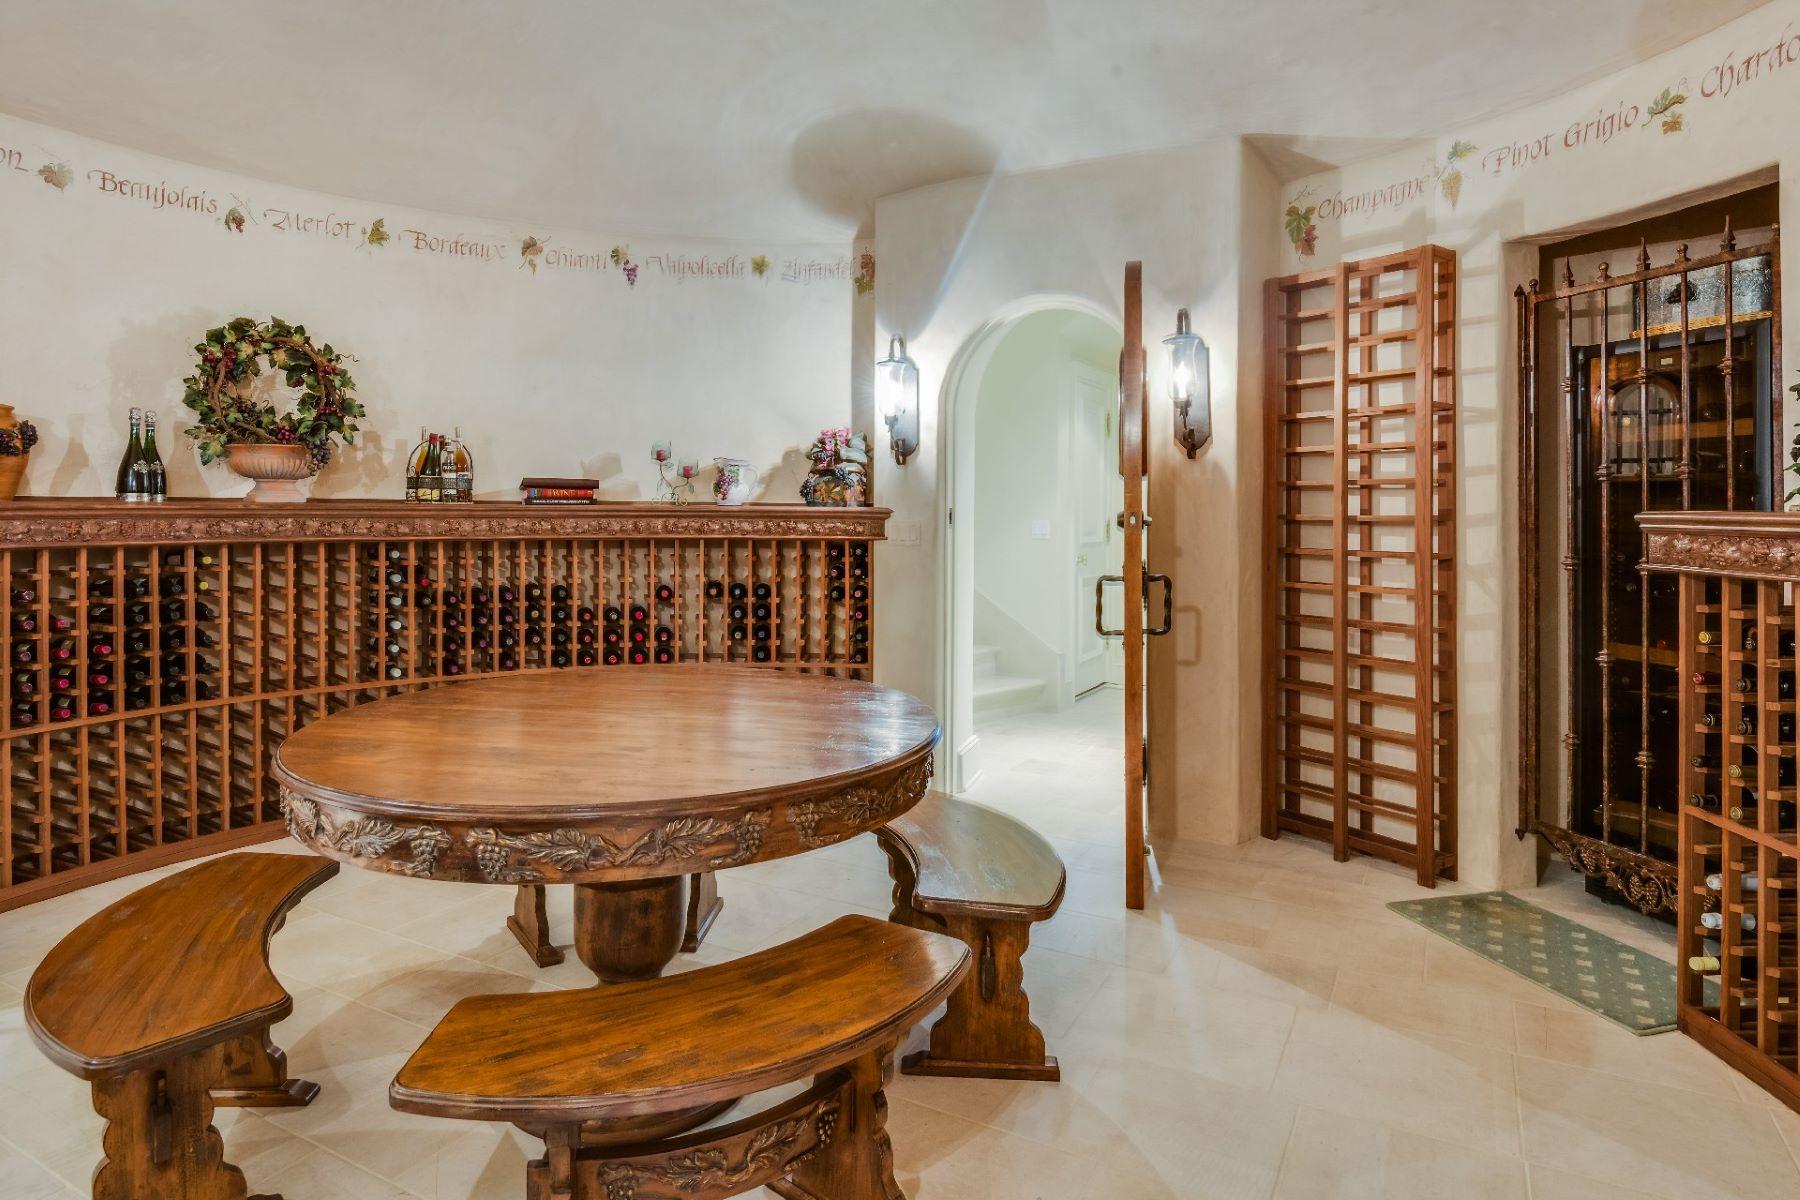 Additional photo for property listing at 609 Paseo Del Mar, Palos Verdes Estates 90274 609 Paseo Del Mar Palos Verdes Estates, California 90274 United States